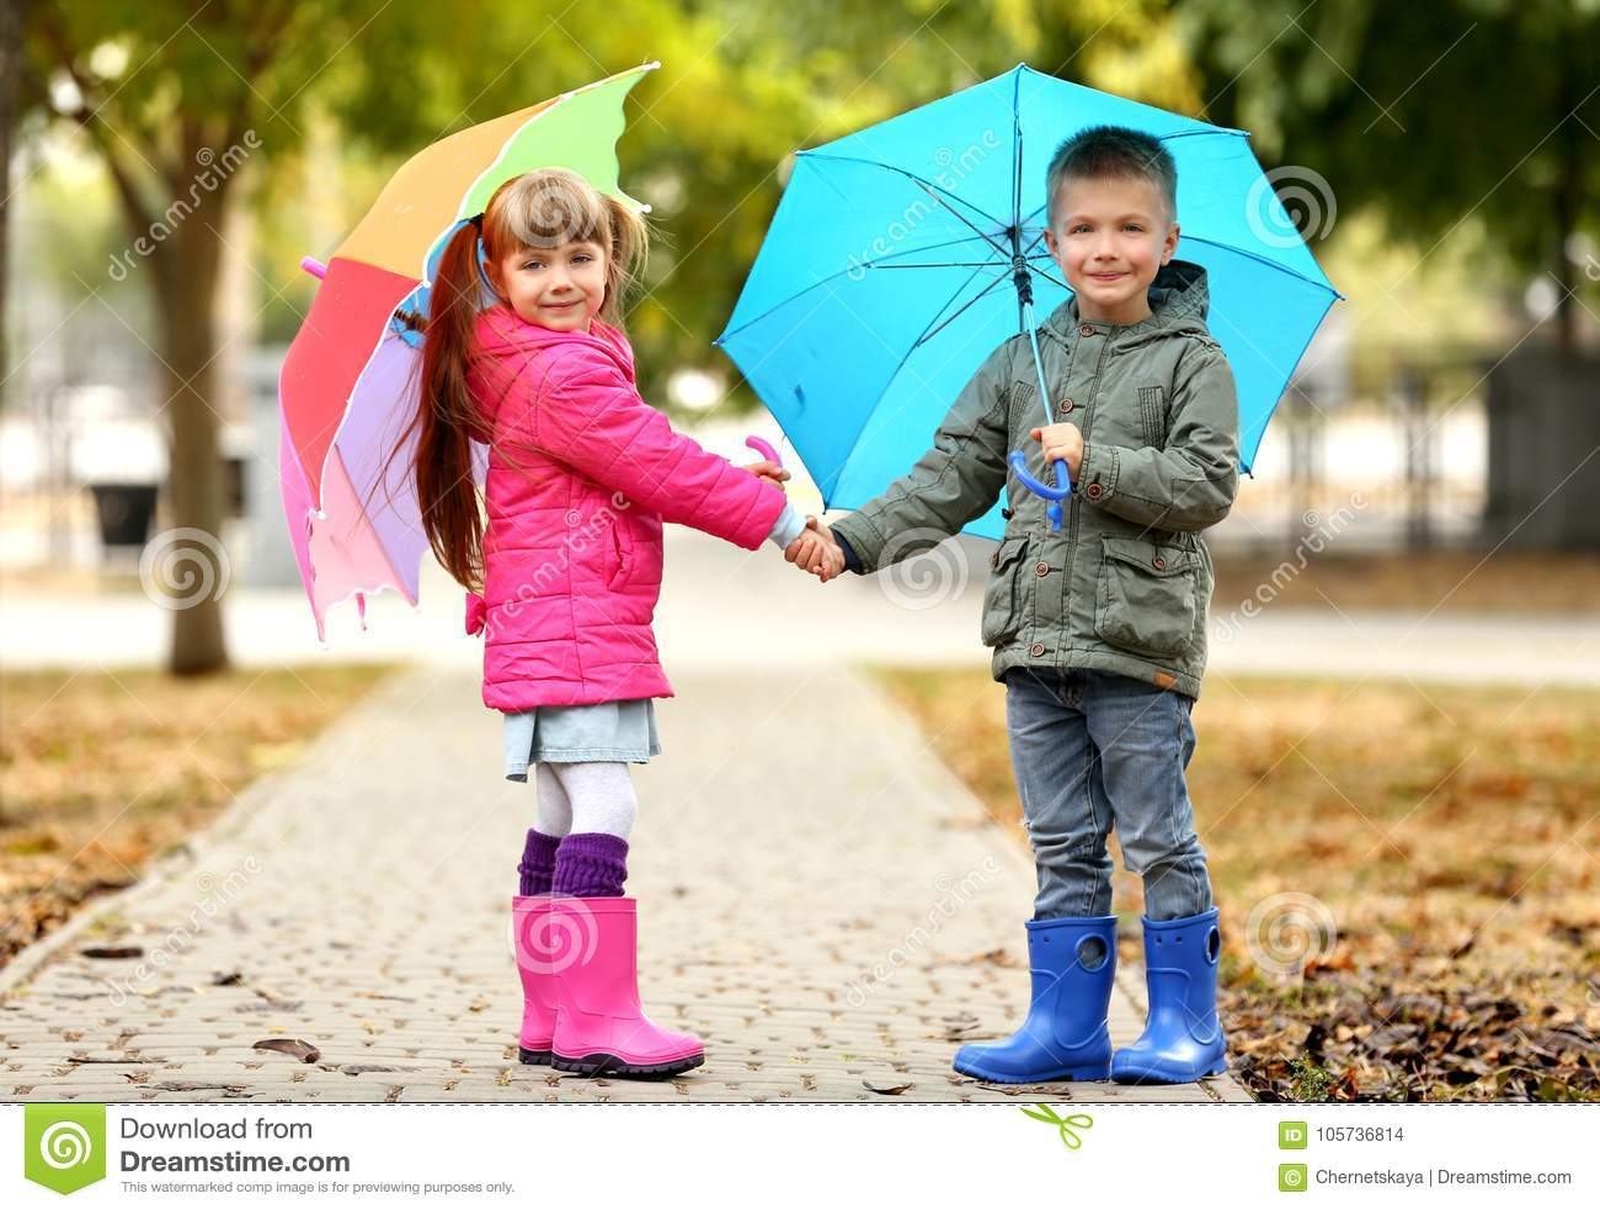 ac4fb56c59f Χαριτωμένα παιδιά με τις ομπρέλες Στοκ Εικόνες - εικόνα από χέρια ...